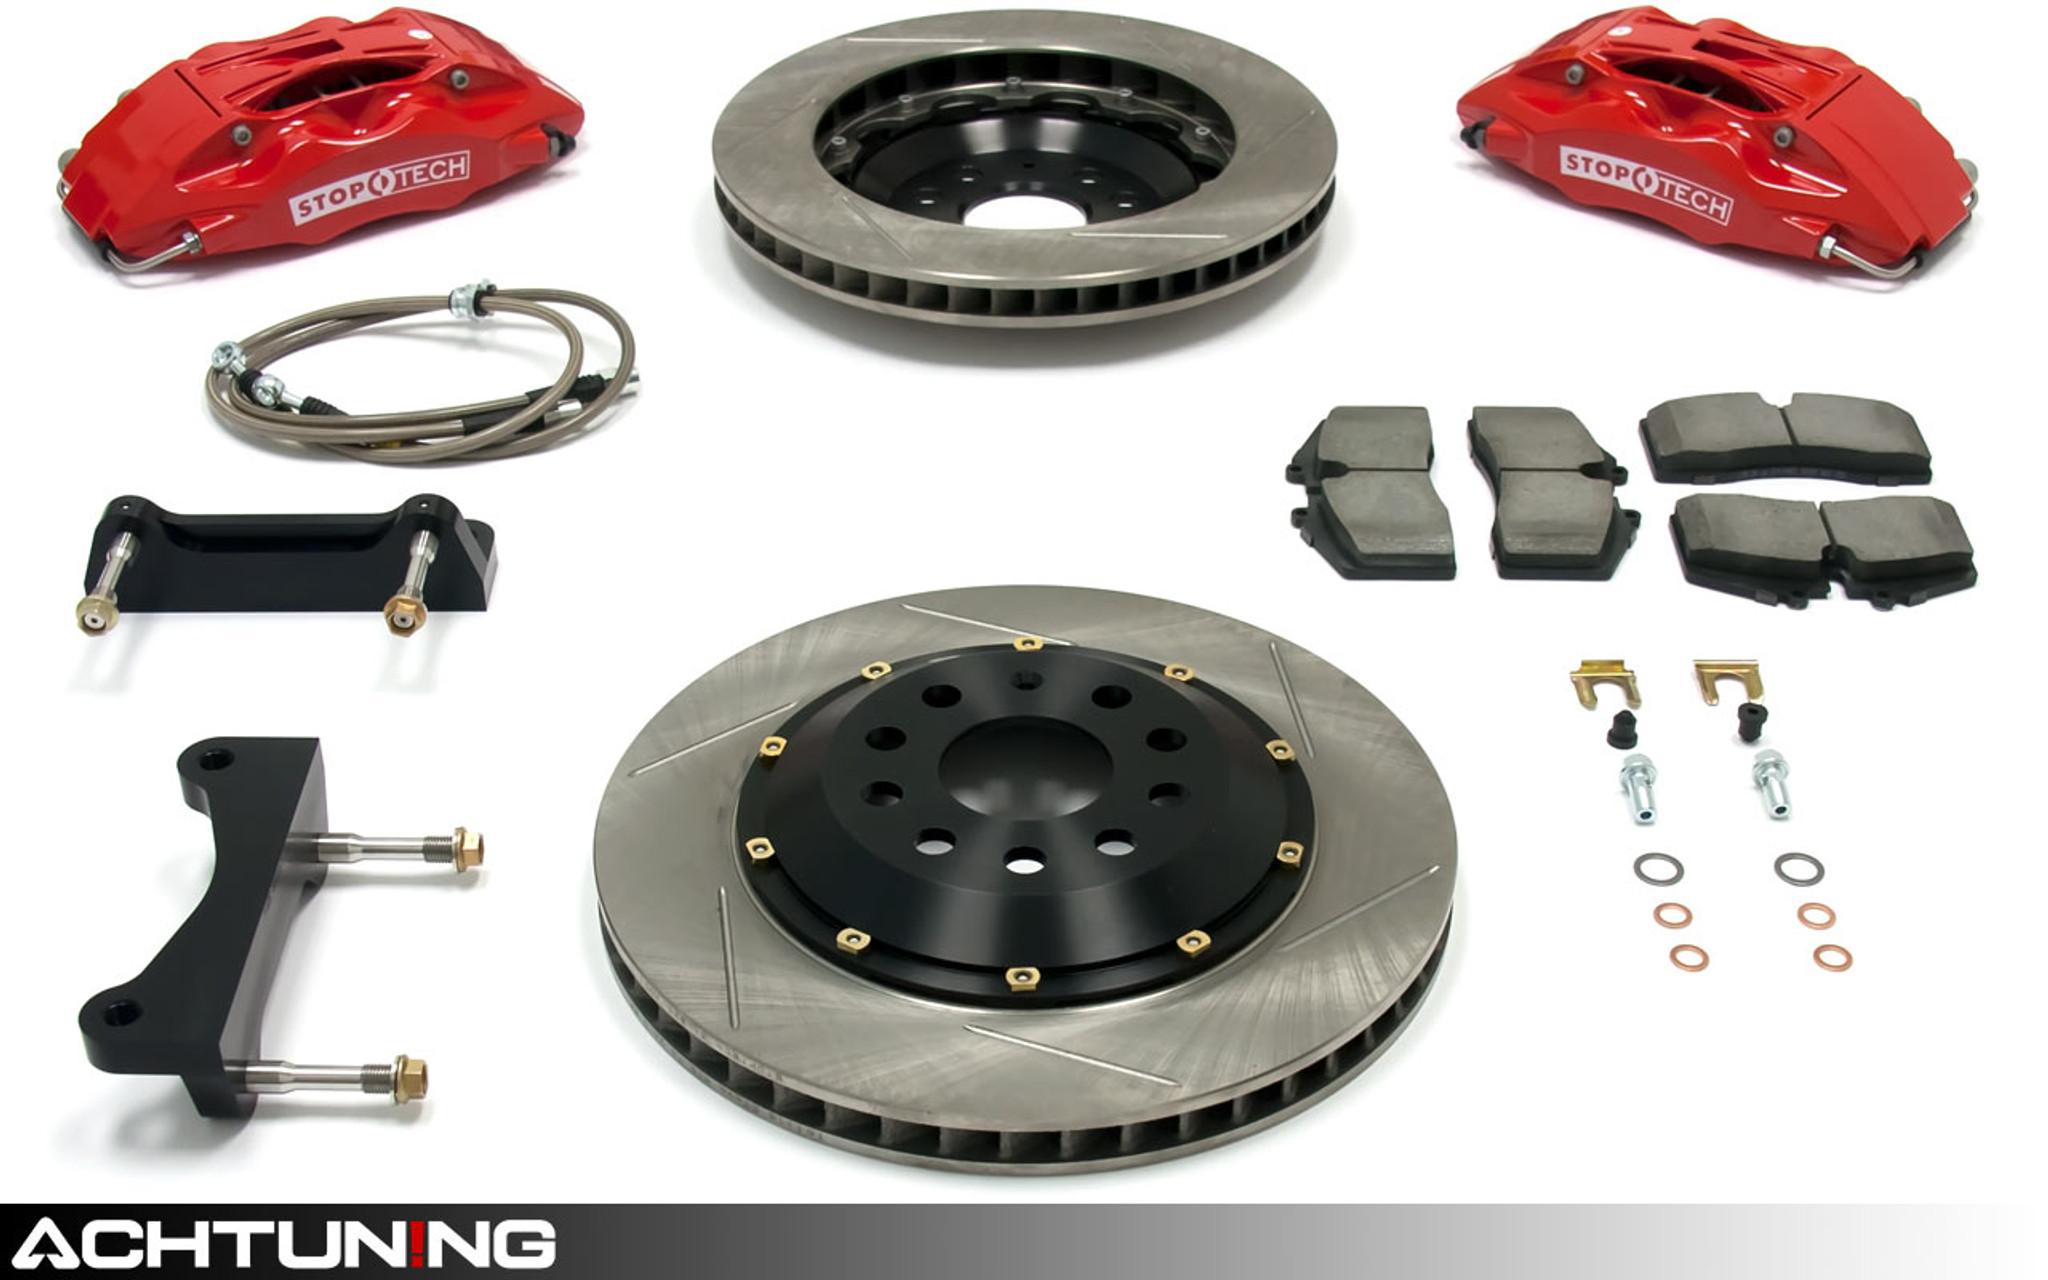 CACHES CHROME ENTOURAGE ANTIBROUILLARDS pour LAND RANGE ROVER 02-09 L322 TD6 V8